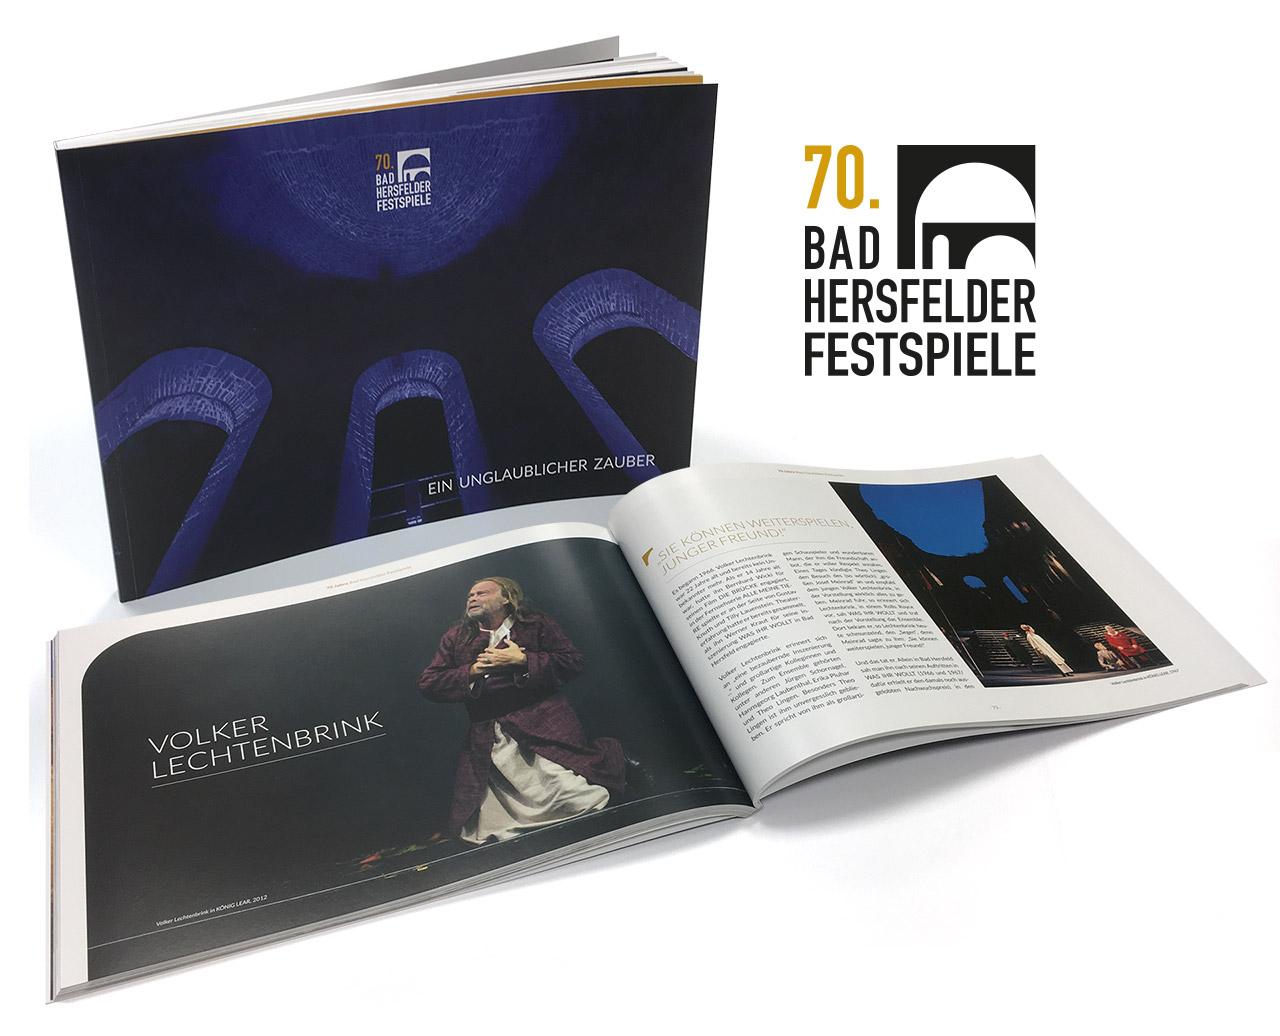 Chronik - 70 Jahre Bad Hersfelder Festspiele